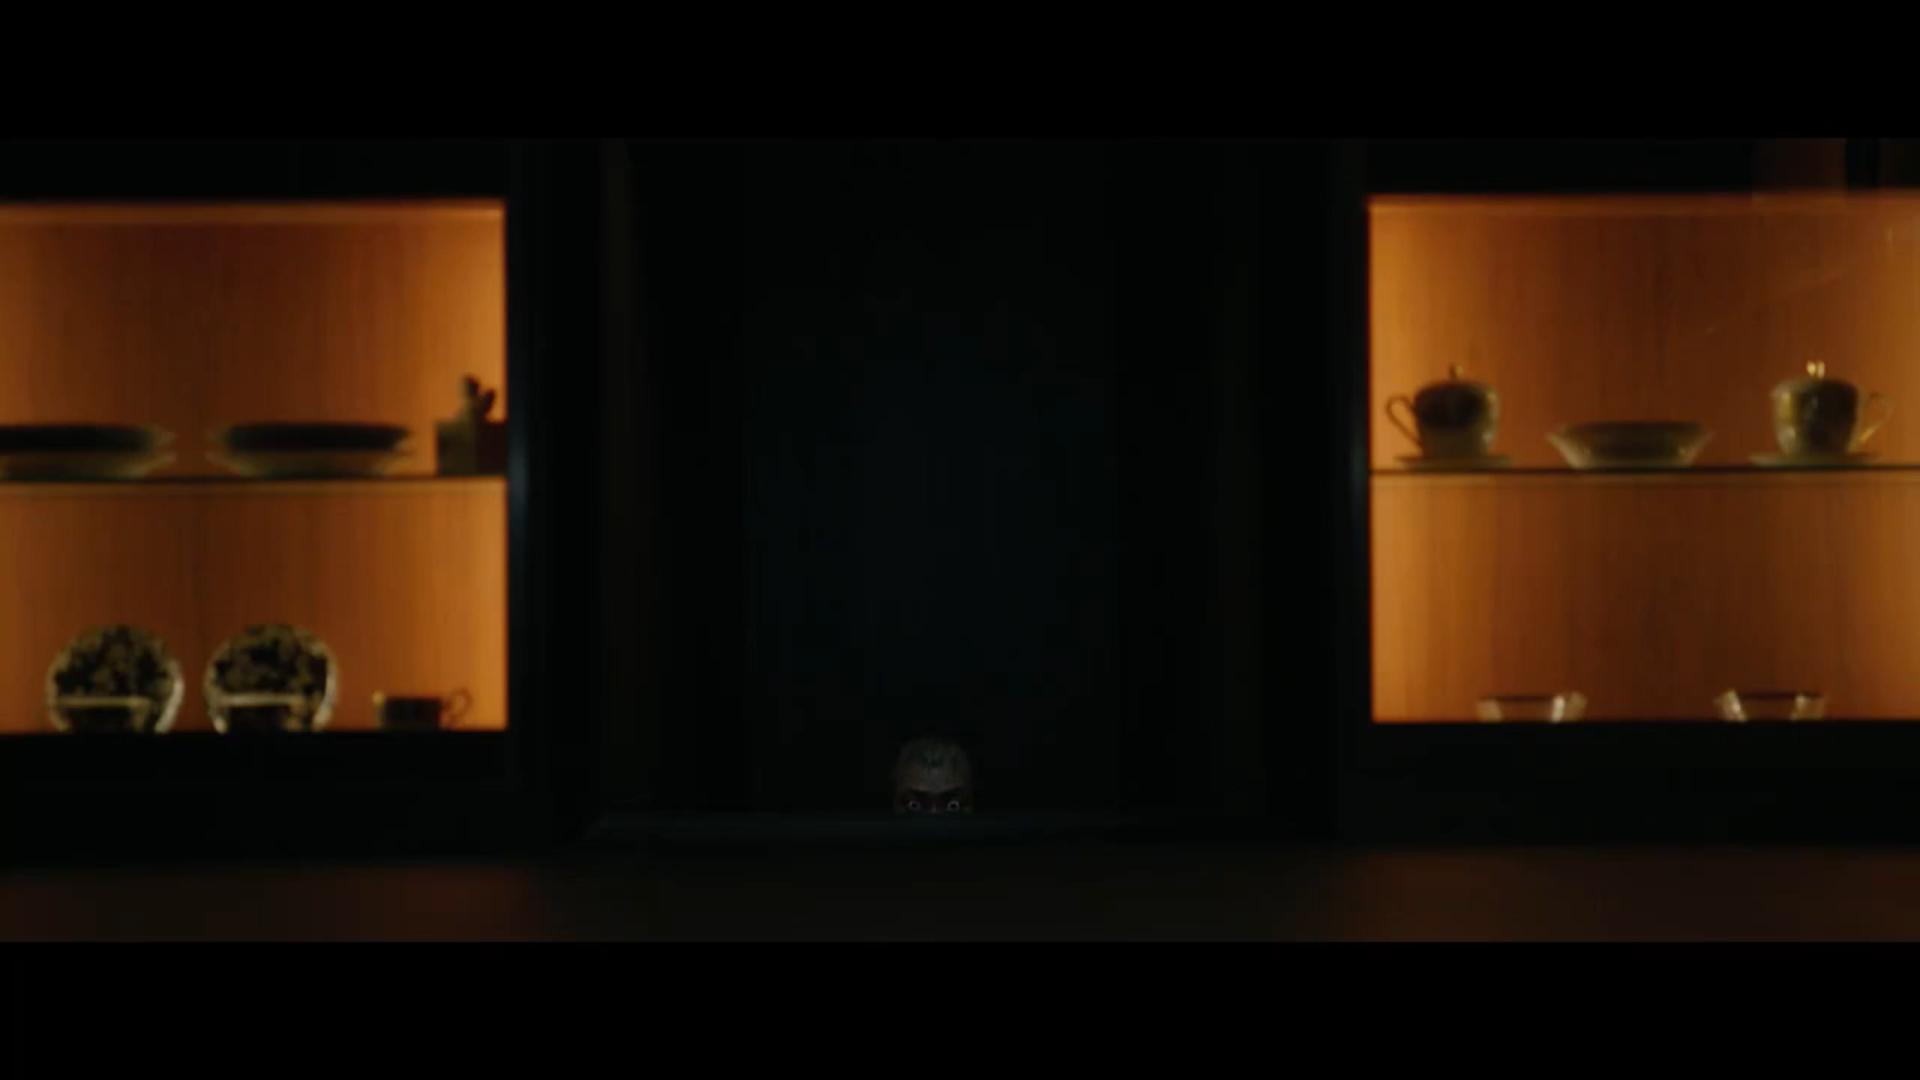 Joon Ho Bong Parasite In 2020 Ghost Scene Parasite Joon Ho Bong